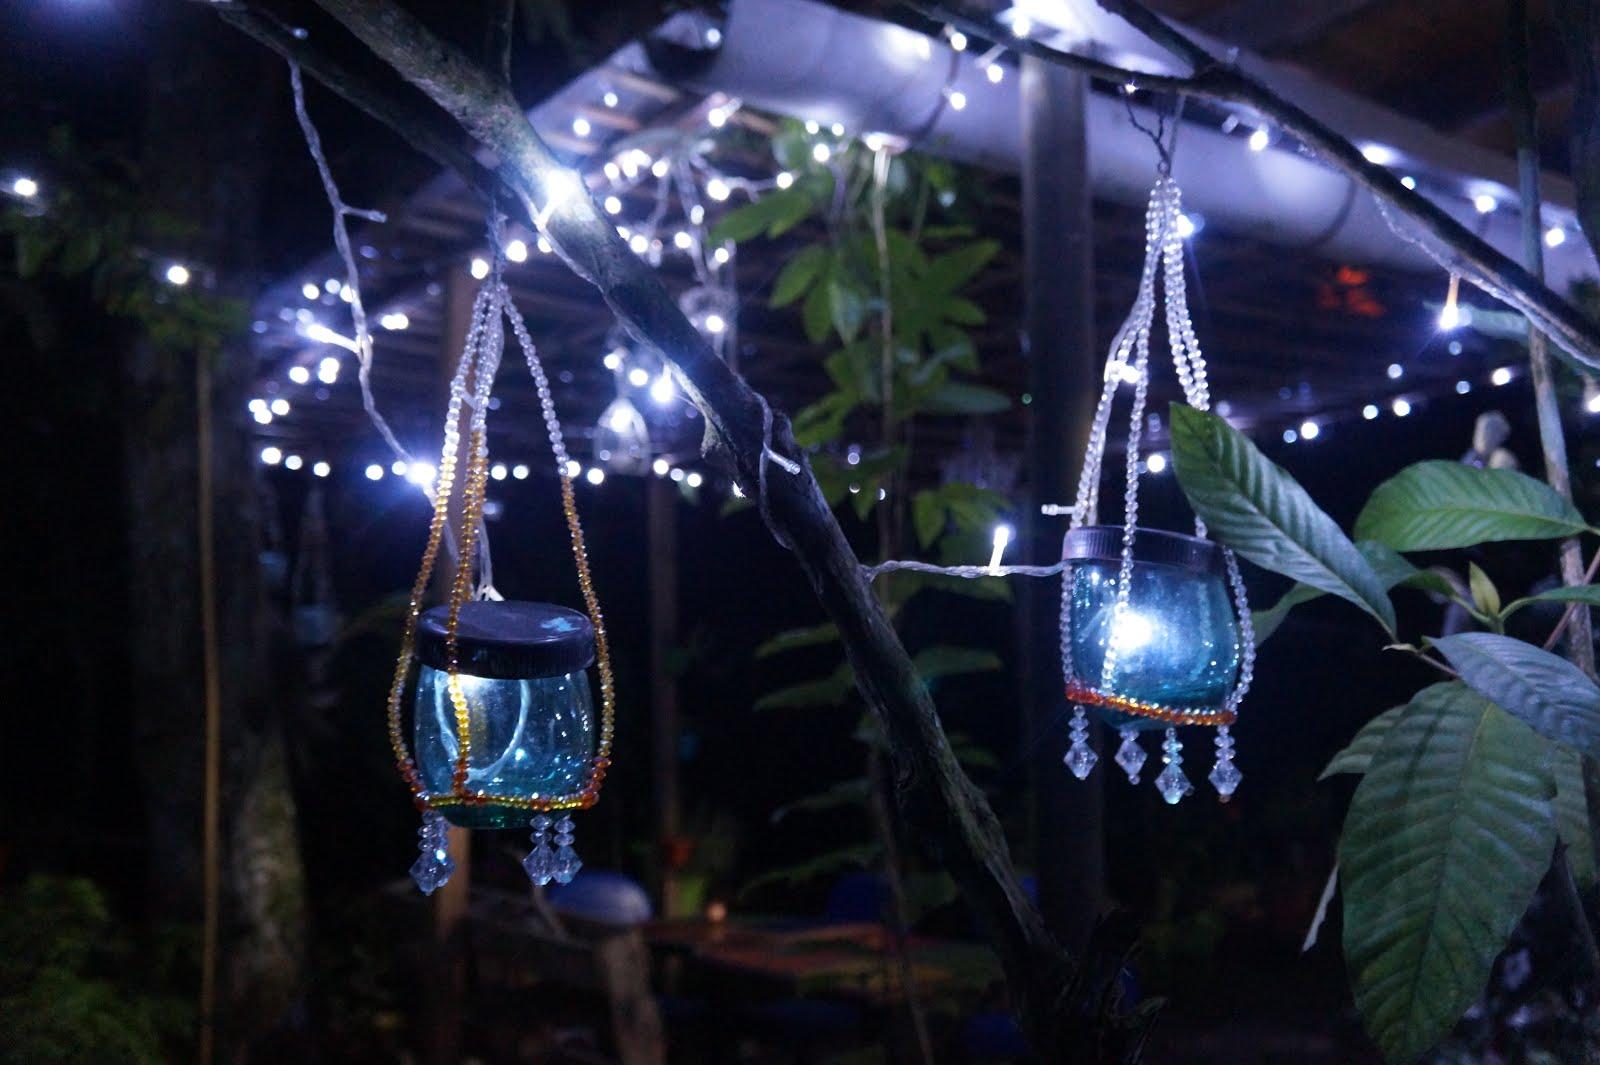 patio exterior prgola reciclaje luces iluminacin rstica iluminacion exterior